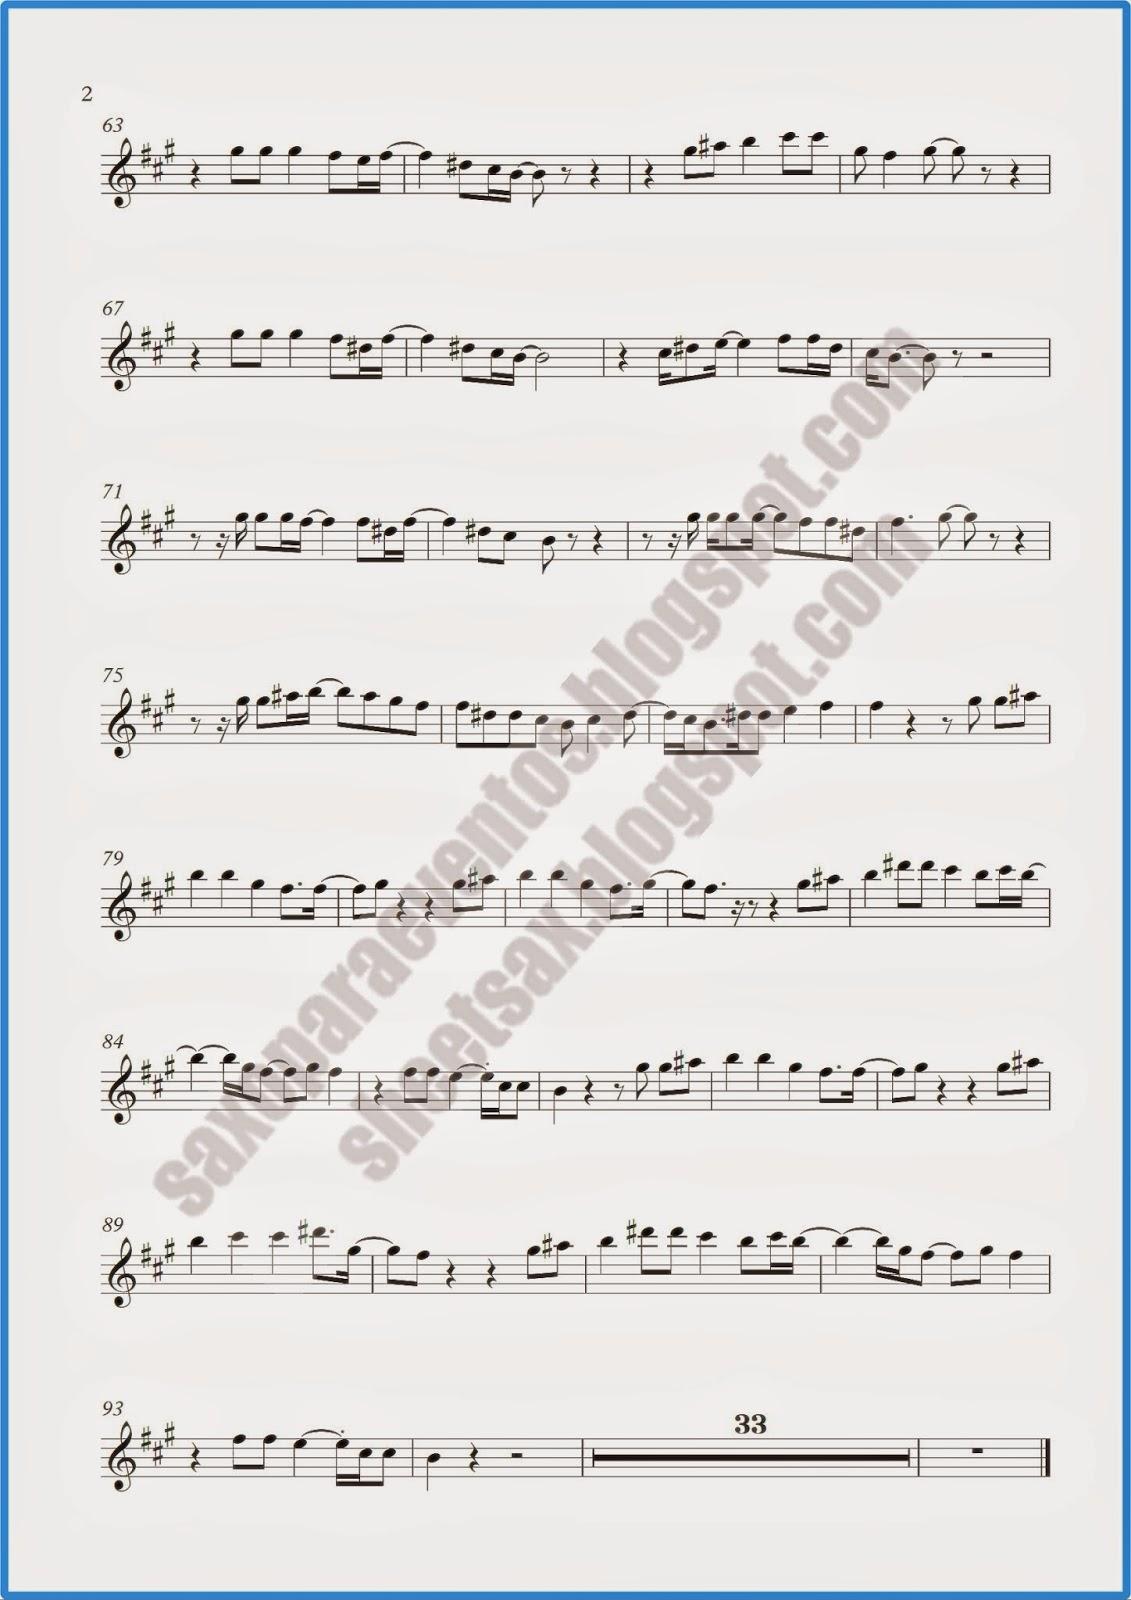 wake me up avicii piano sheet music pdf